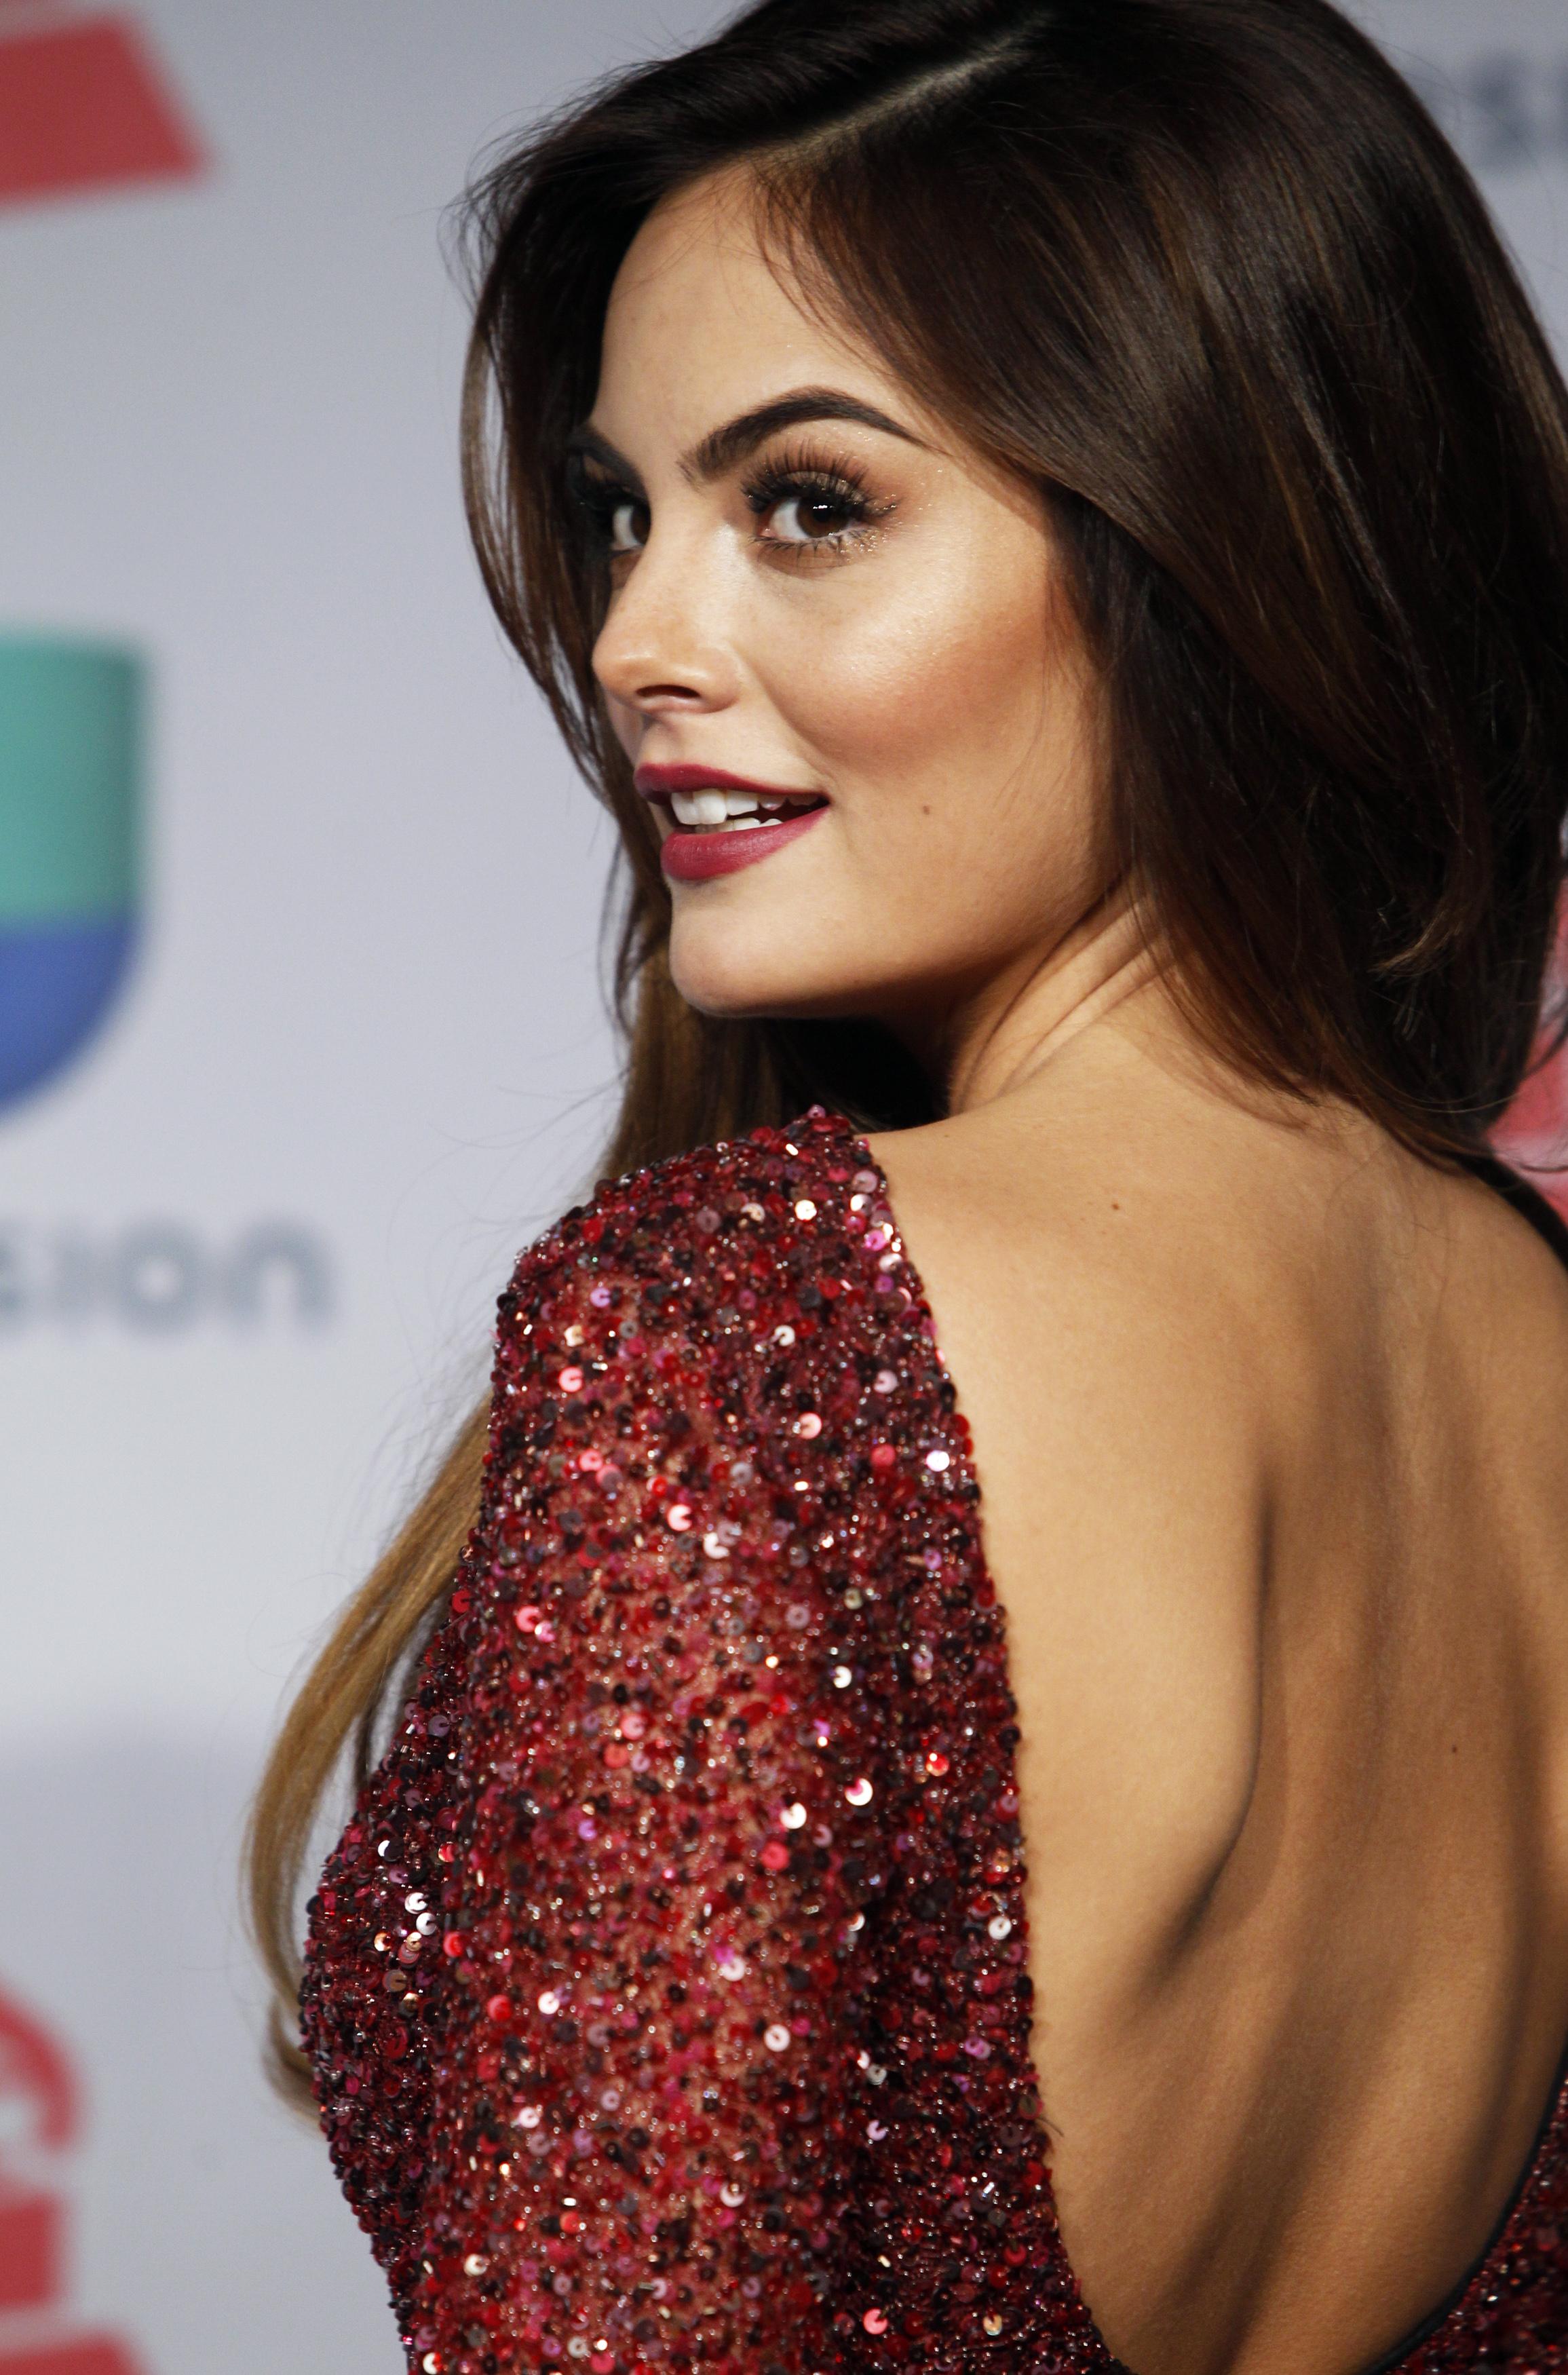 Presenter Ximena Navarrete poses backstage during the 14th Latin Grammy Awards in Las Vegas, Nevada November 21, 2013.  REUTERS/Steve Marcus (UNITED STATES Tags: Entertainment) (GRAMMYS-BACKSTAGE) - RTX15NY7